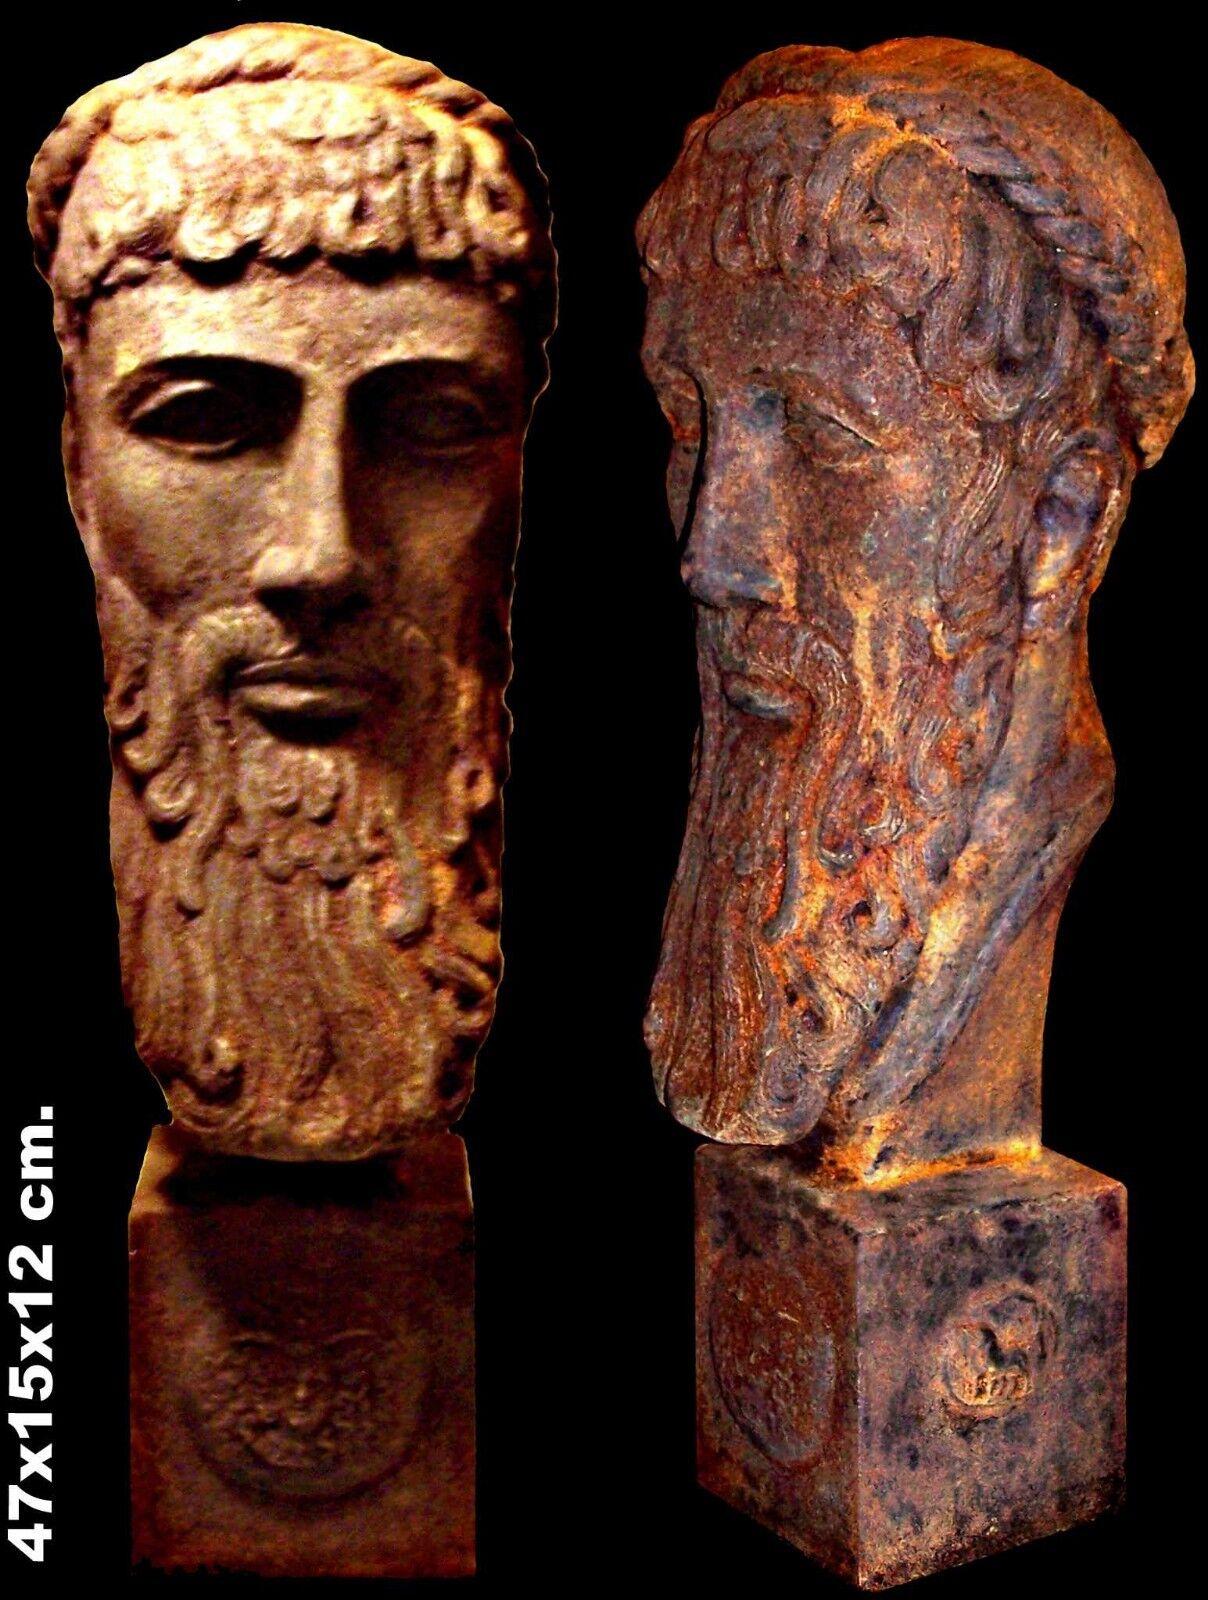 Griego antiguo escultura Zeus Olímpico Dios Arte Estatua Busto tamaño real 47cm obra de arte